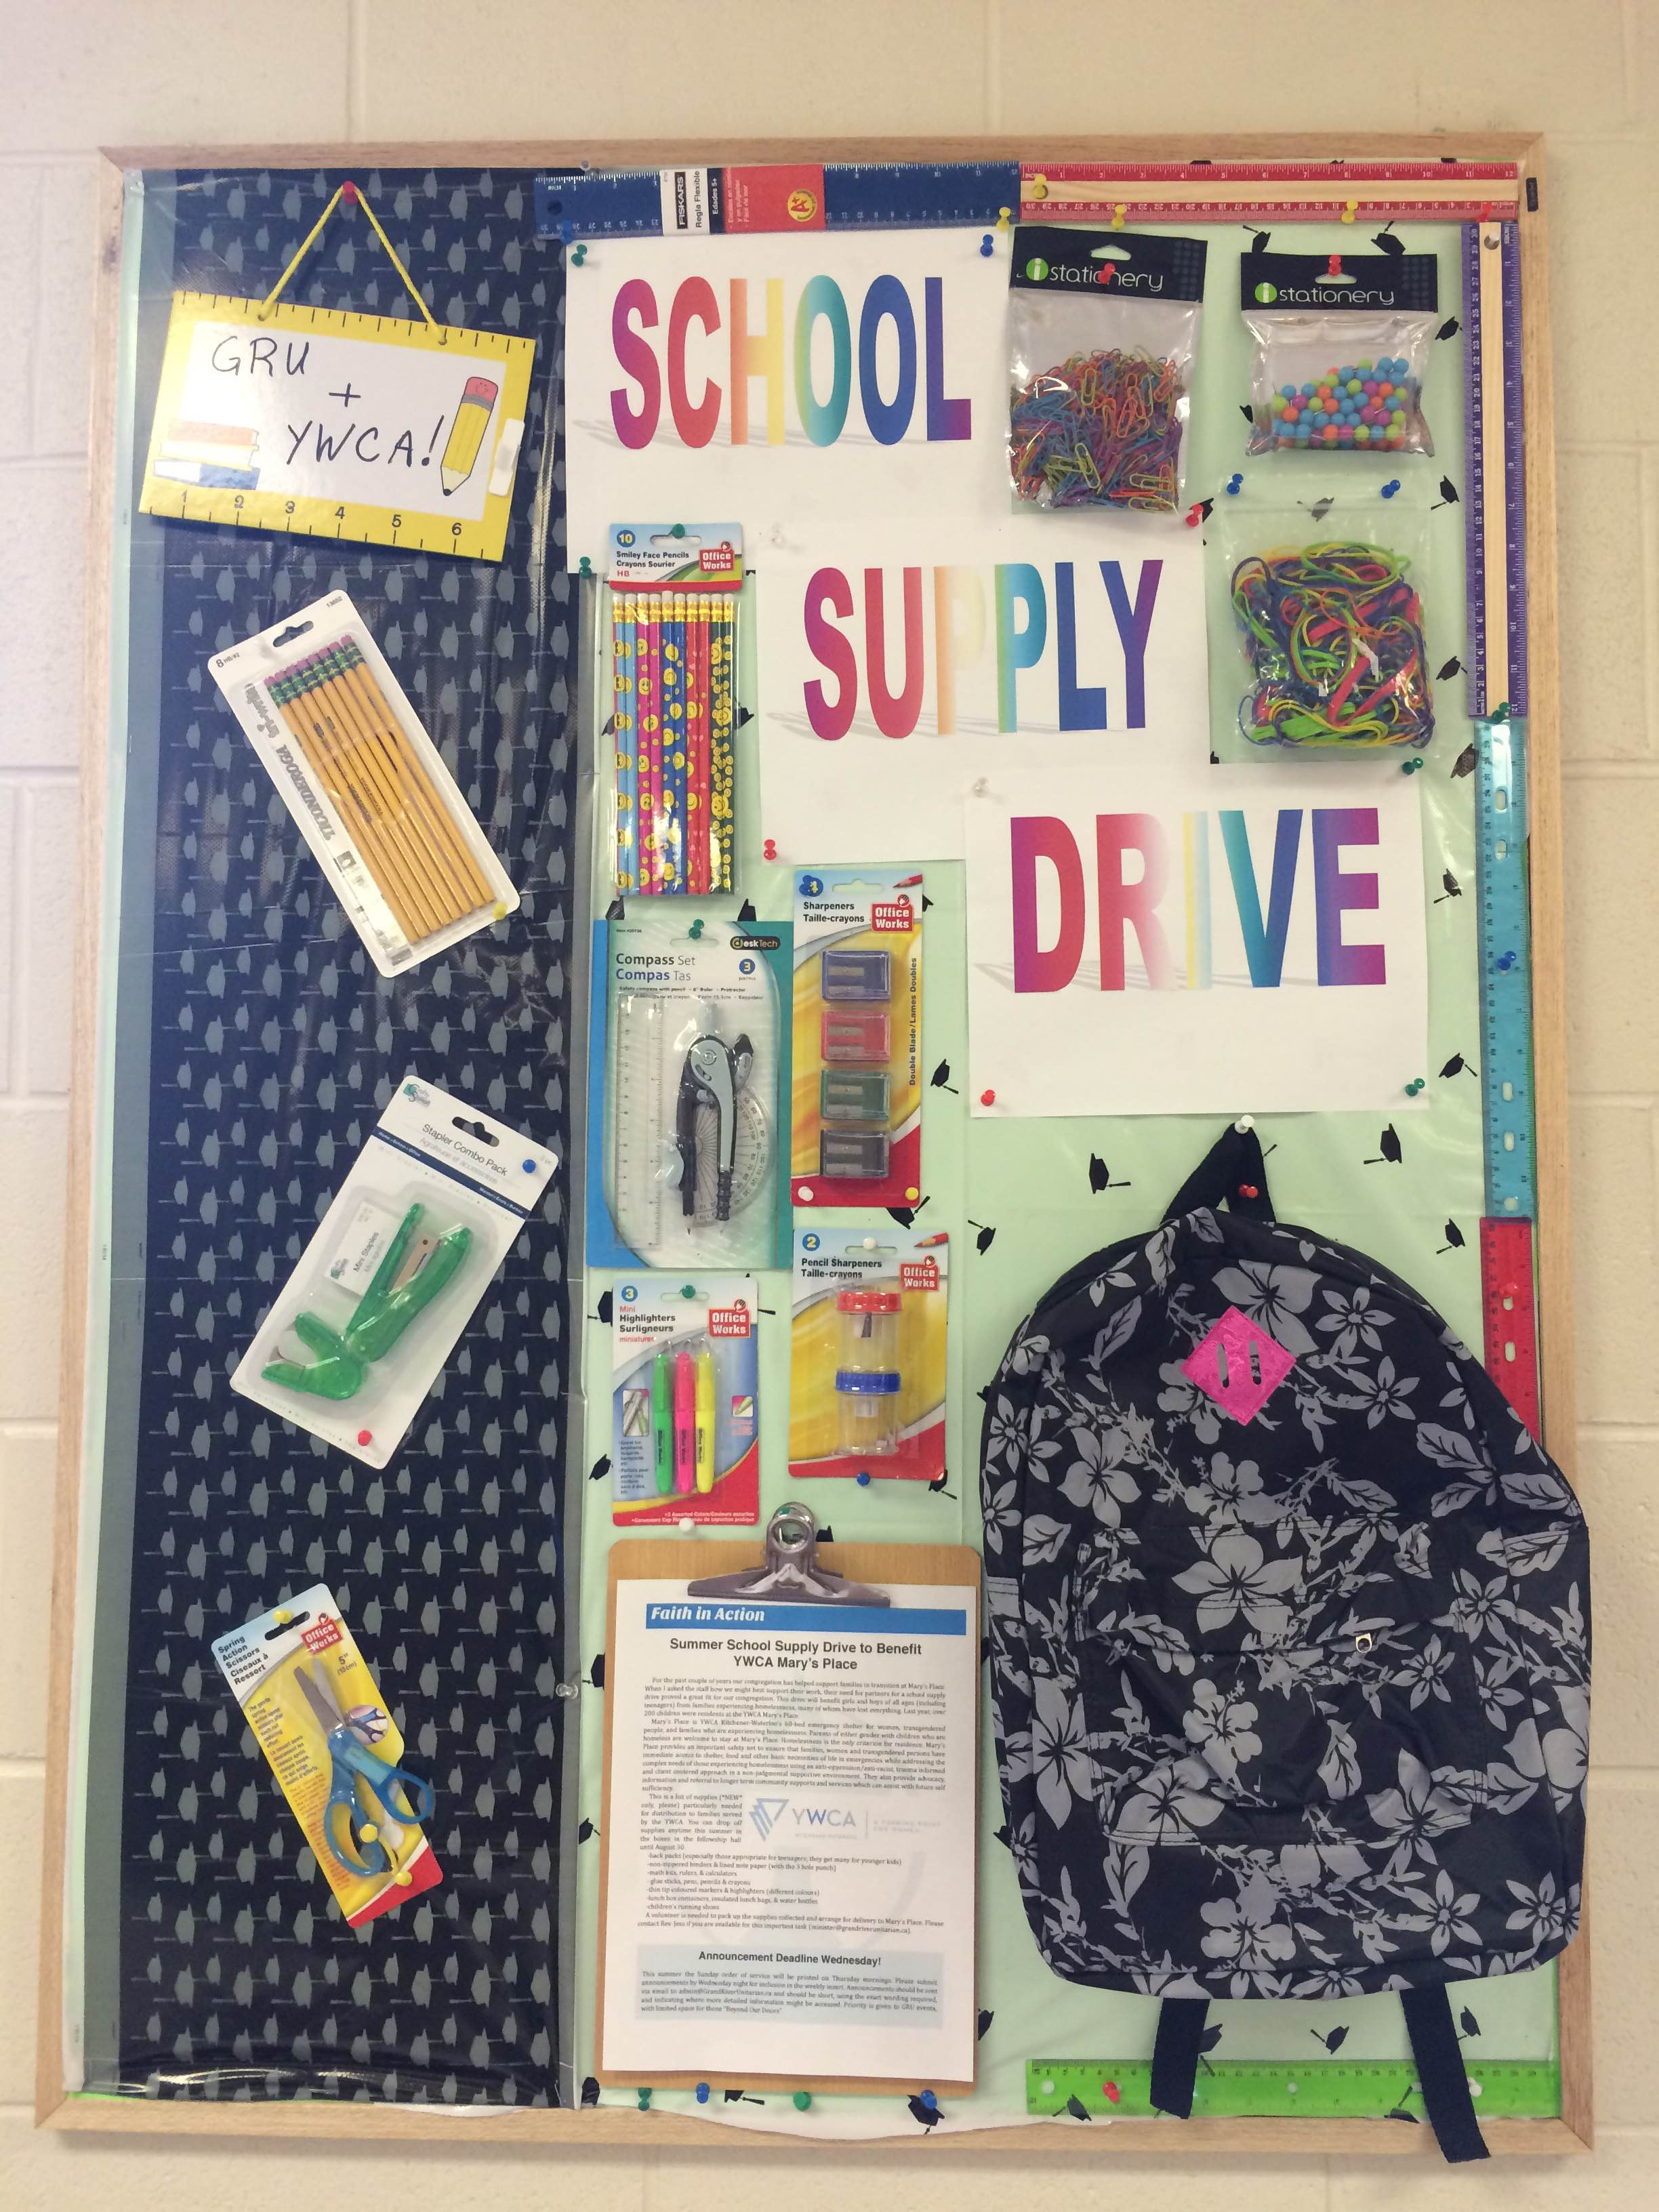 school supplies drive.JPG